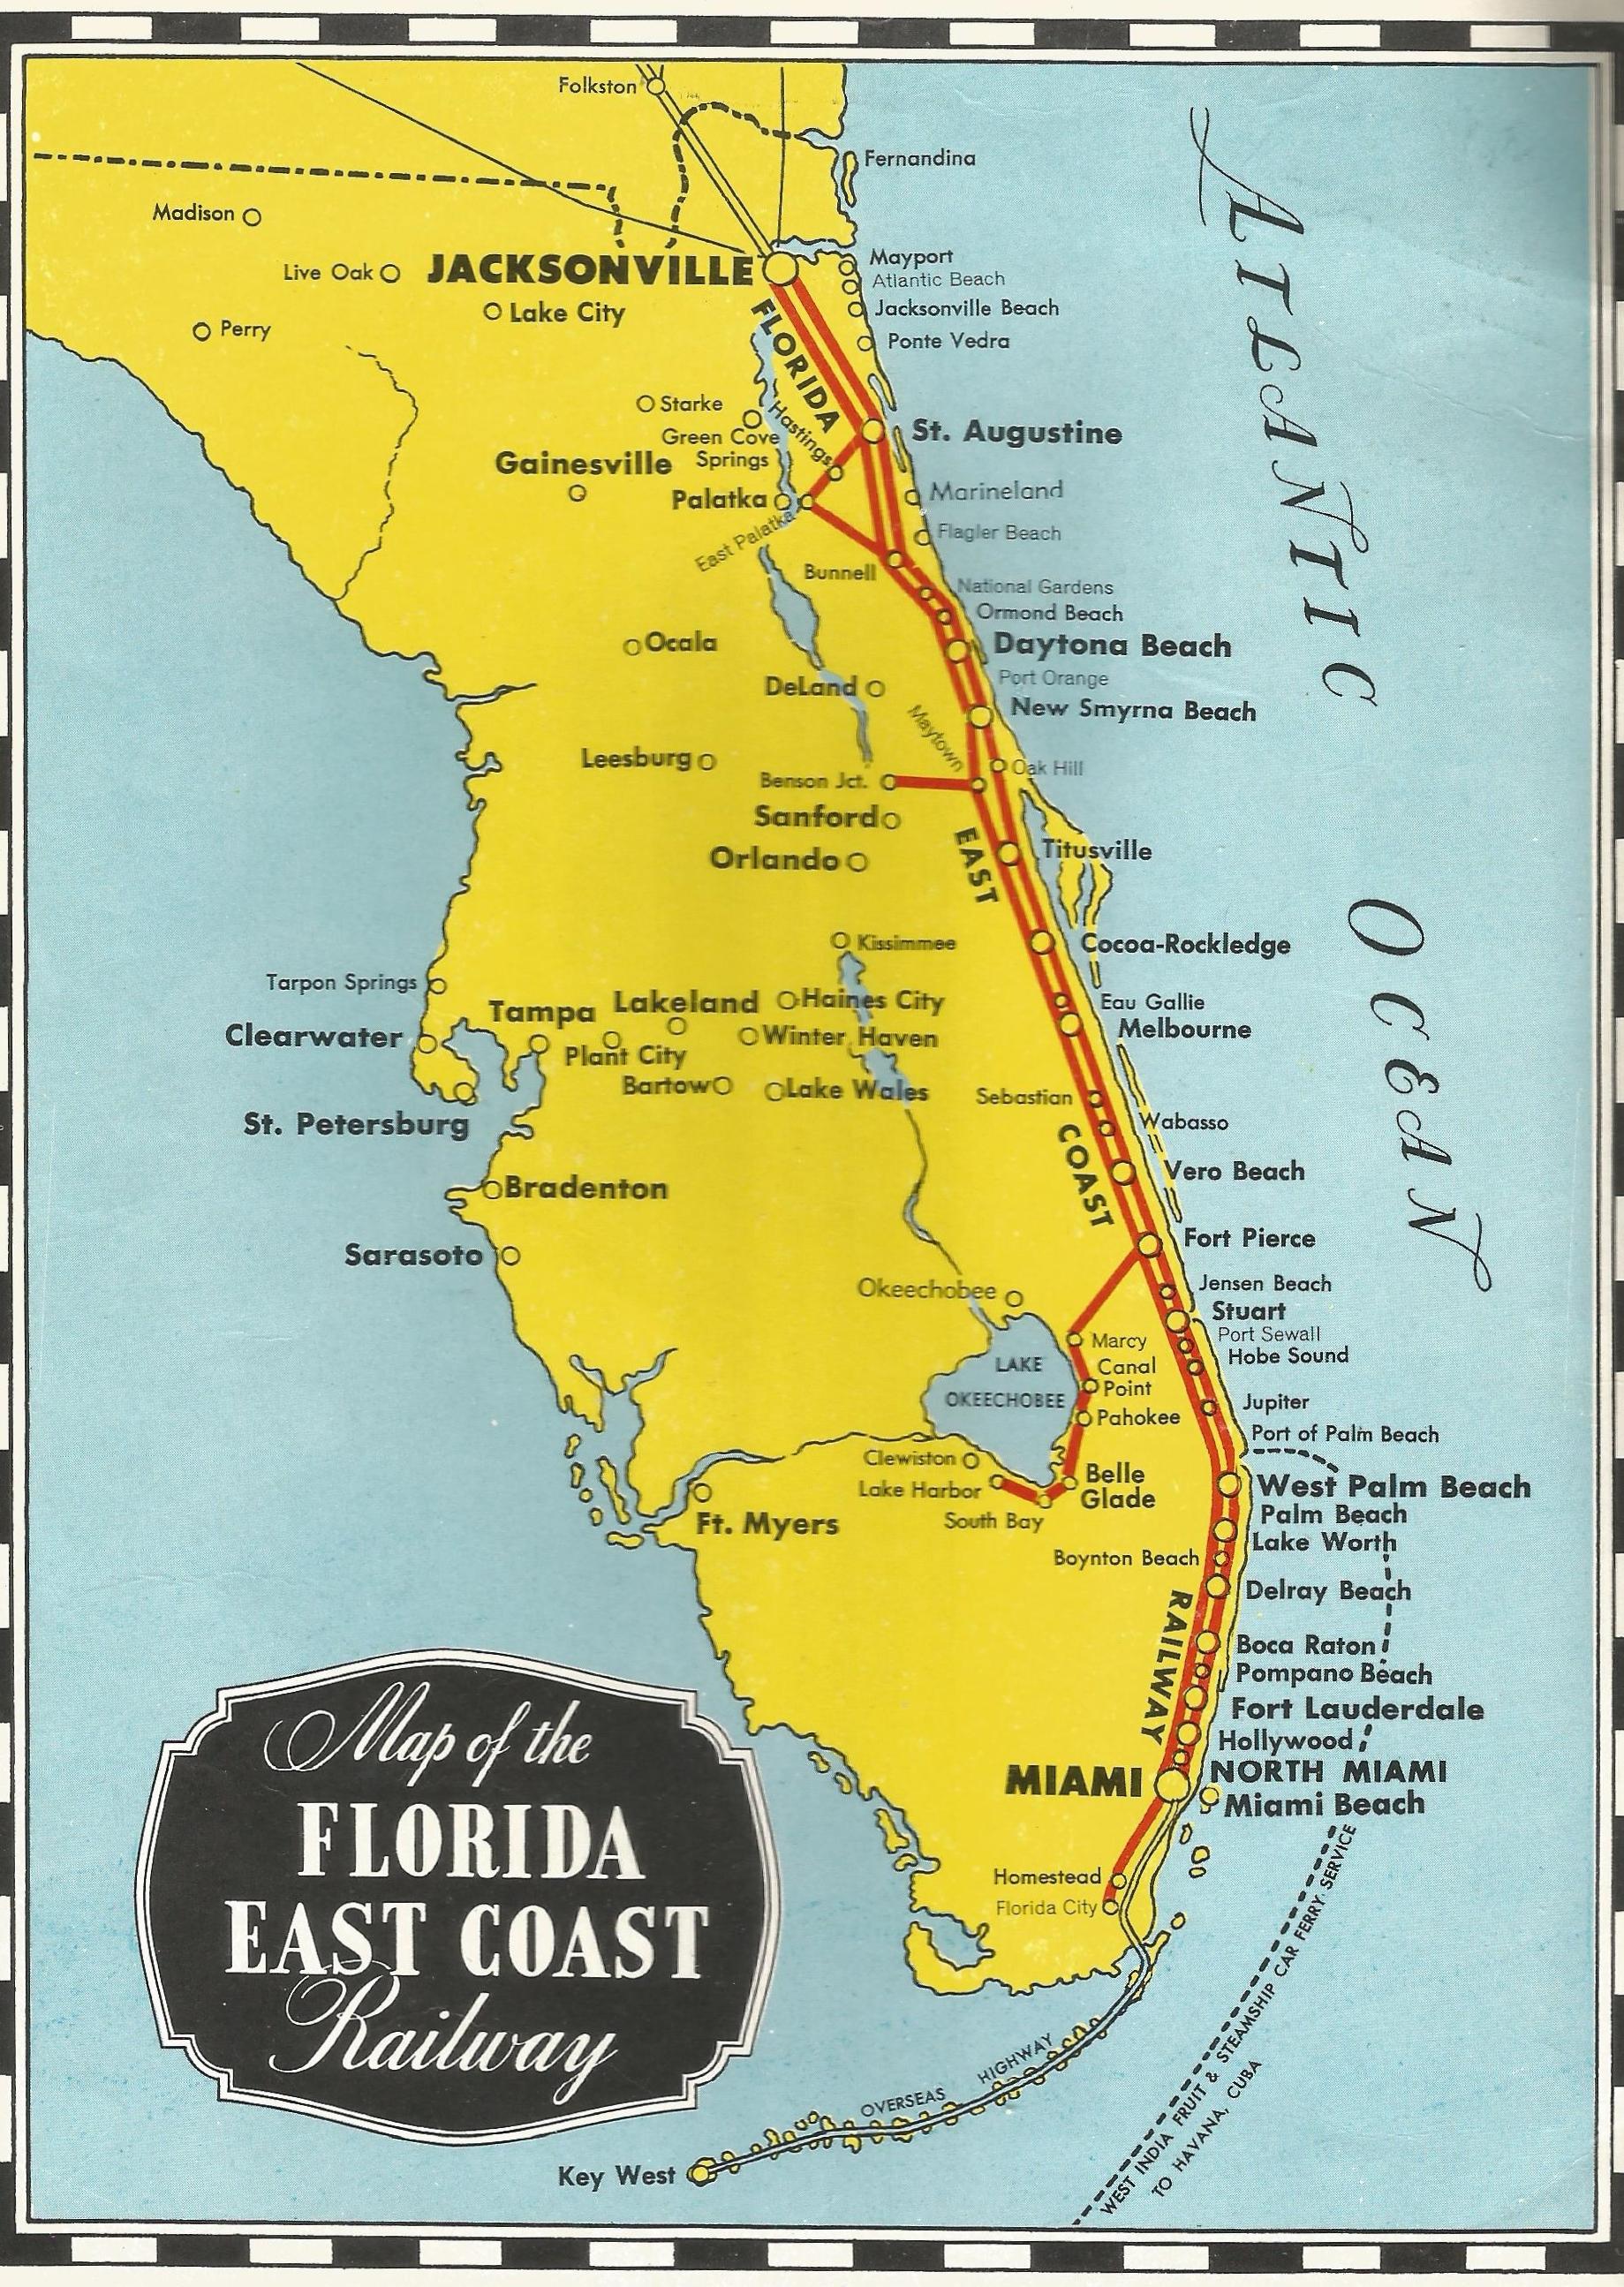 S Florida East Coast Railway Booklet